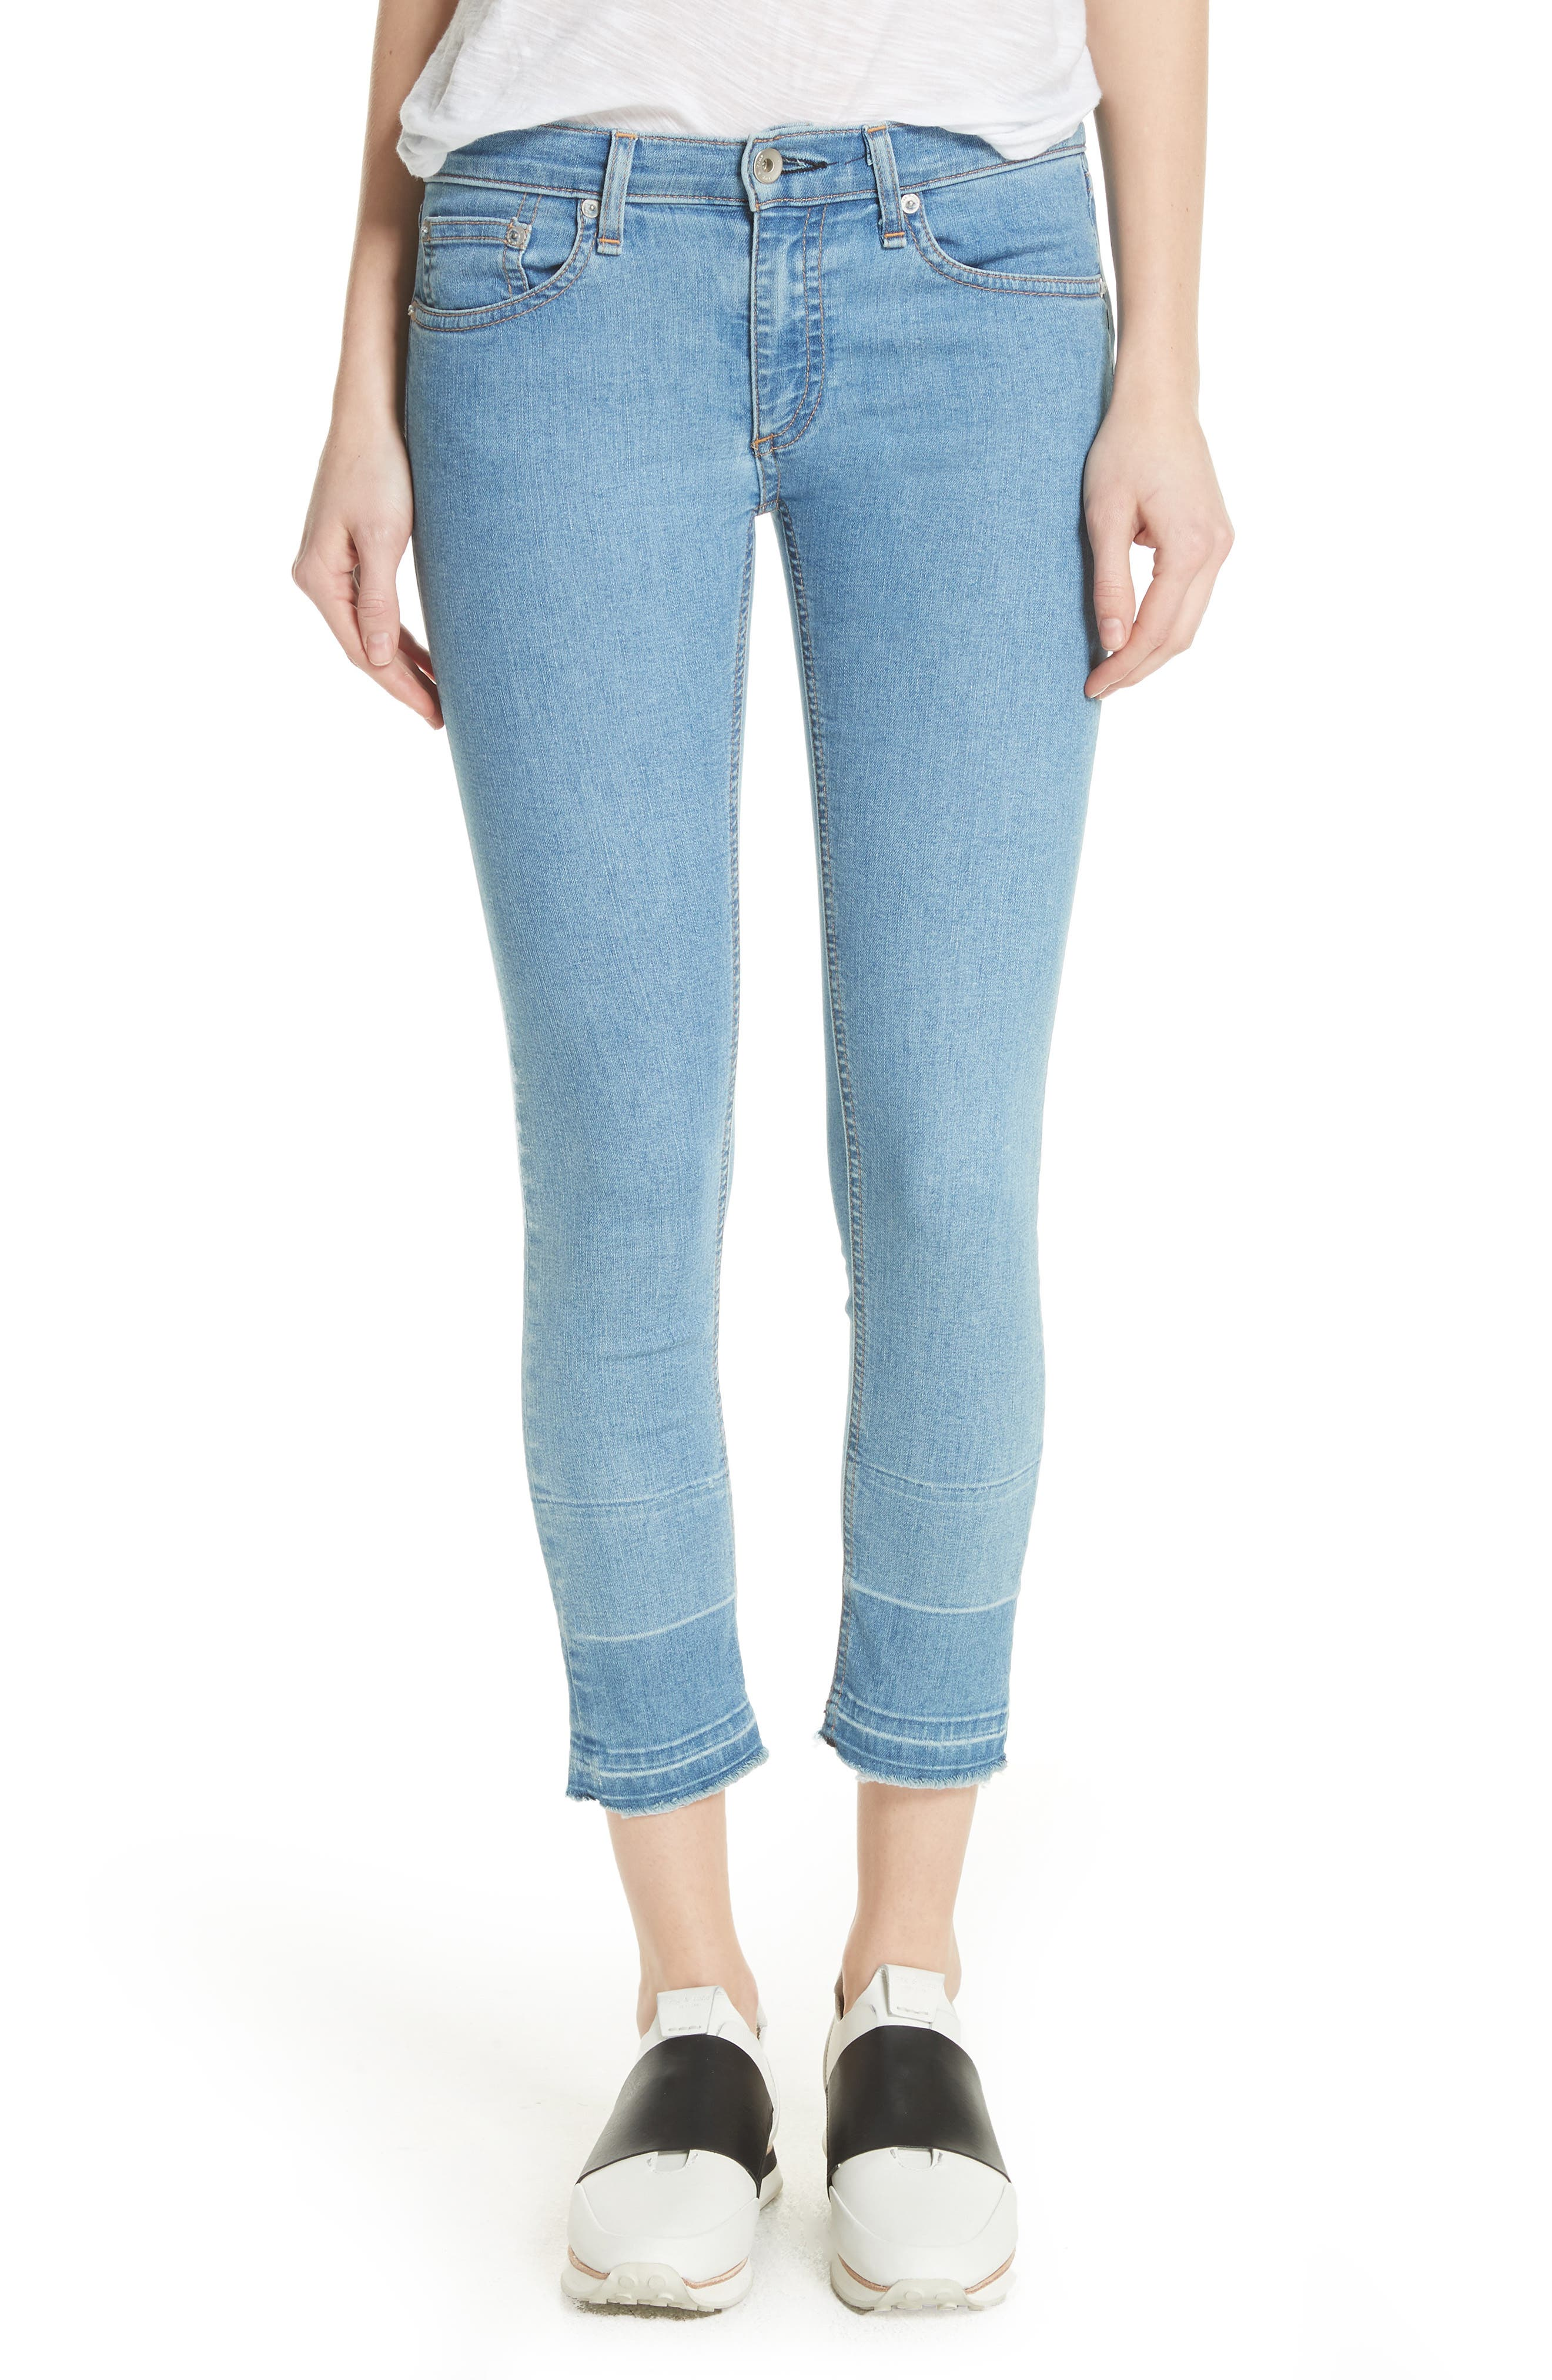 JEAN Release Hem Ankle Skinny Jeans,                             Main thumbnail 1, color,                             409